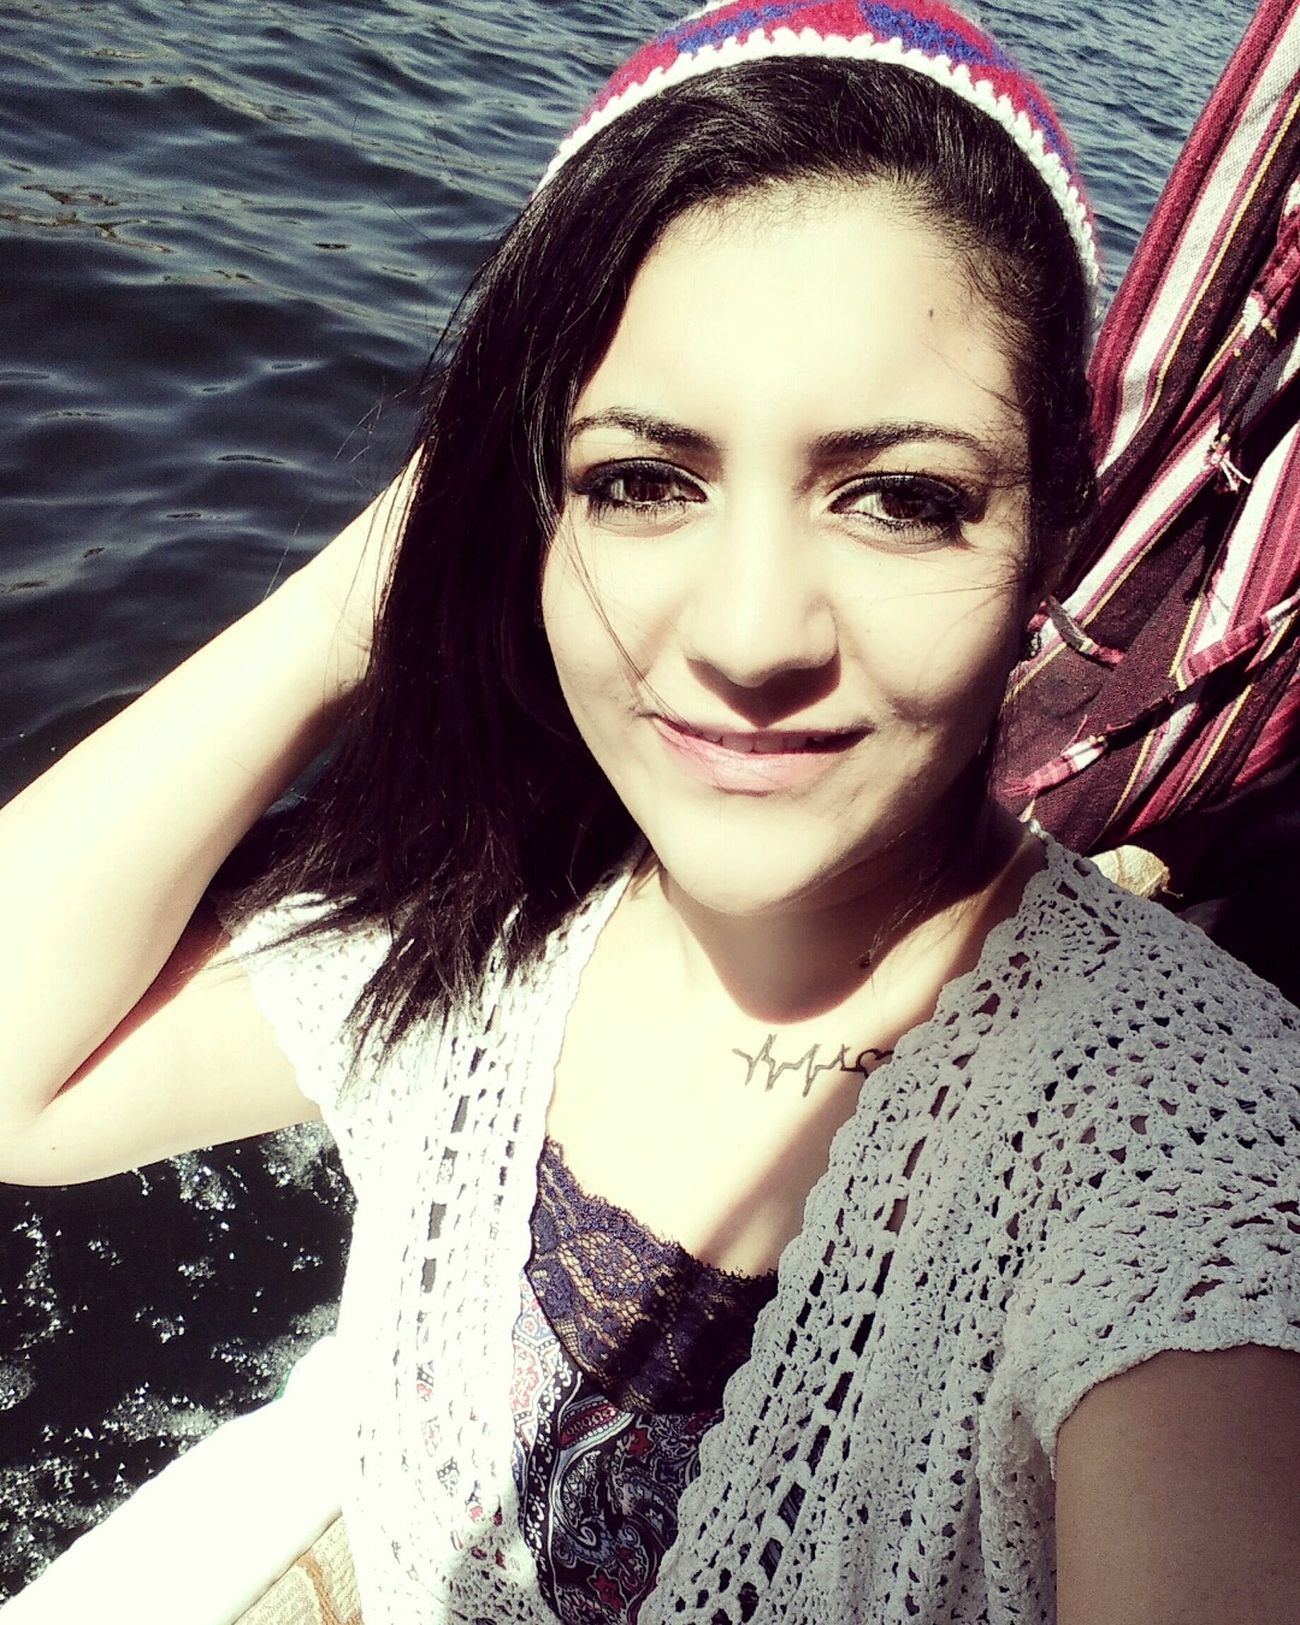 That's Me Aswan, Egypt Real People :) Smile NileRiver Tattoo Love Egypt Selfie ✌ Enjoying Life Enjoying The Sun